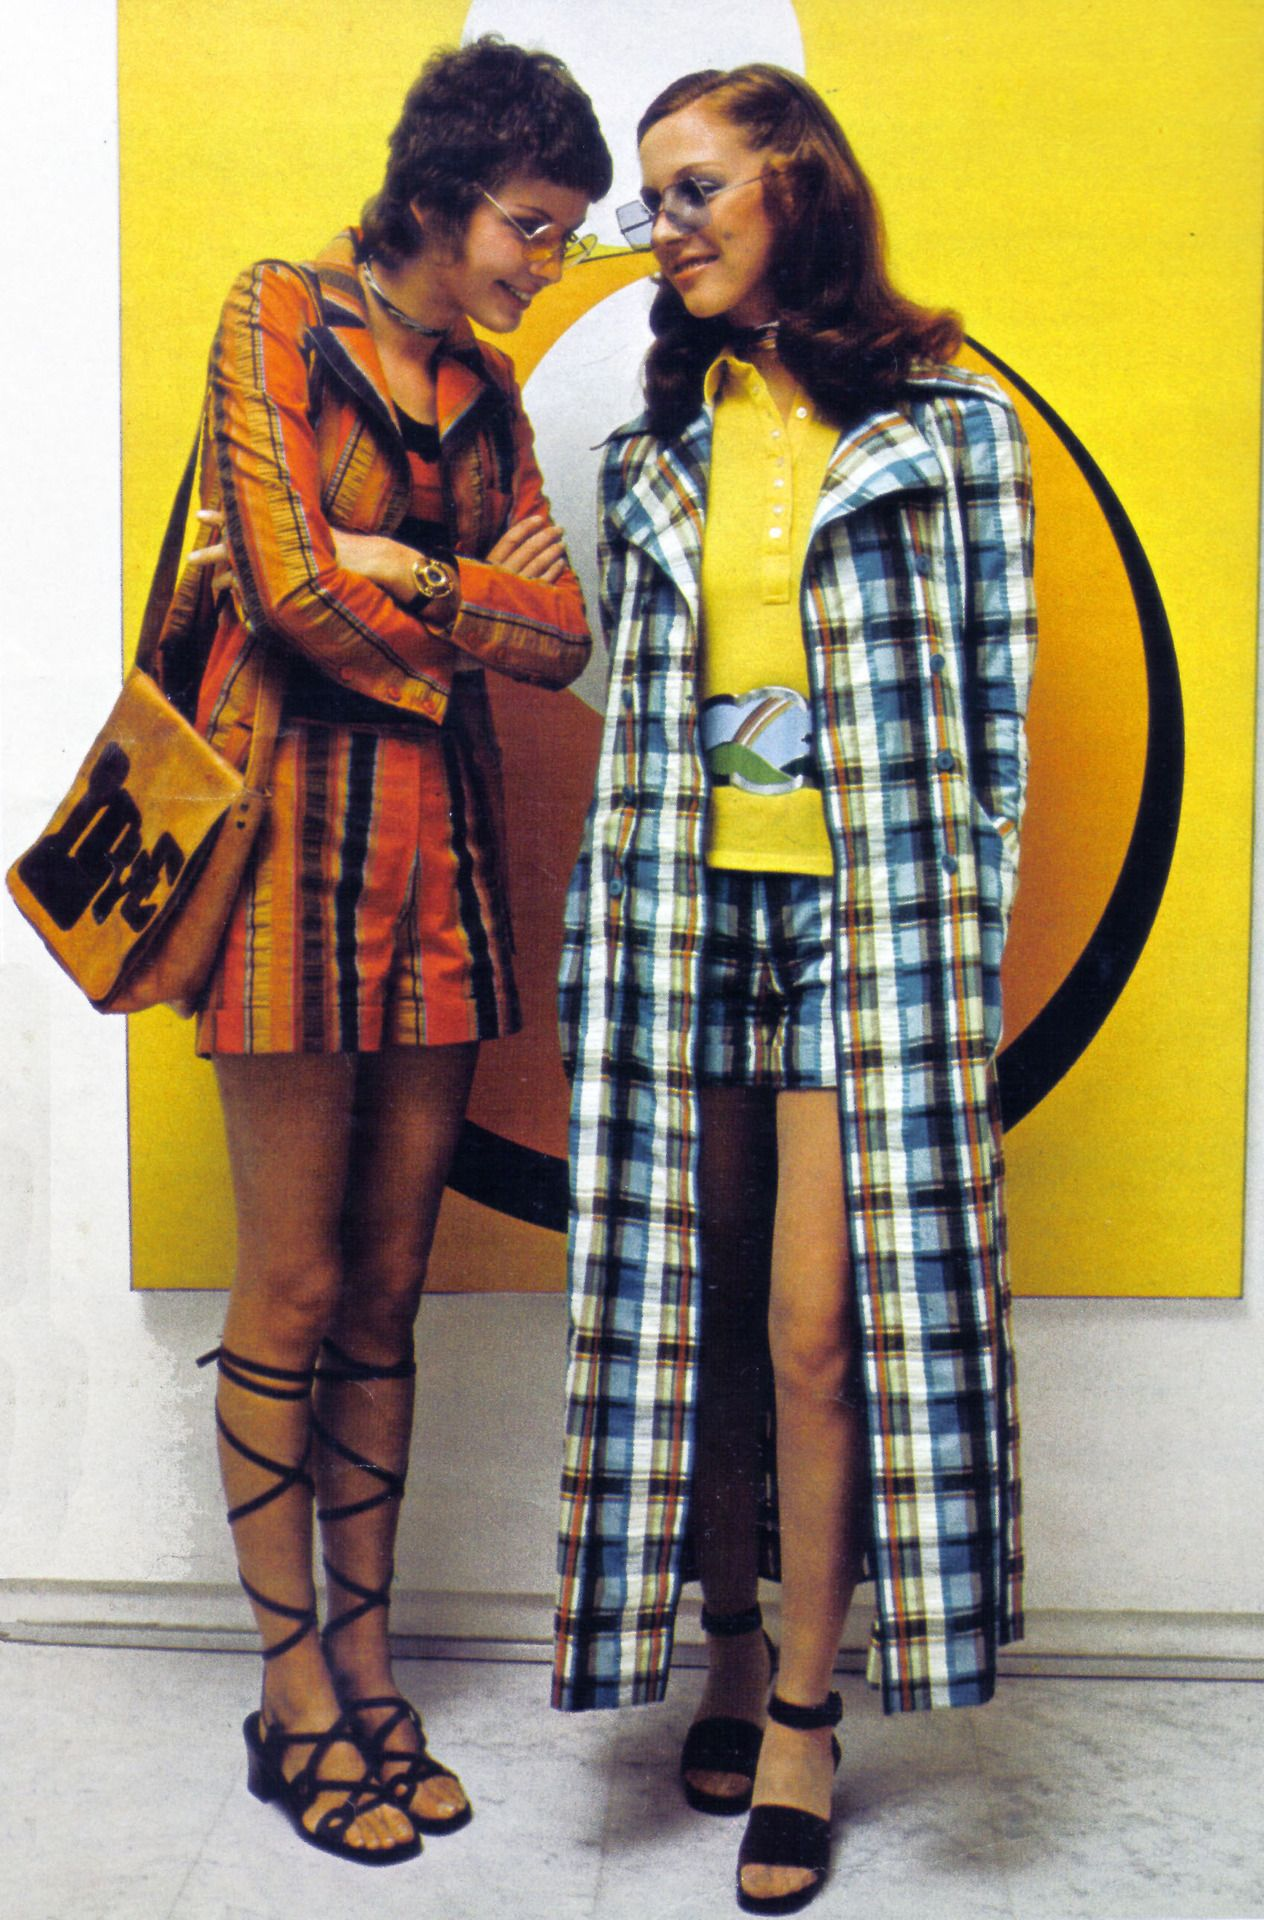 7e5b95eb391 Burda International 1971-72 vintage fashion style short shorts long coat jumpsuit  shorts suit tan orange brown blue white black plaid yellow shirt sandals ...